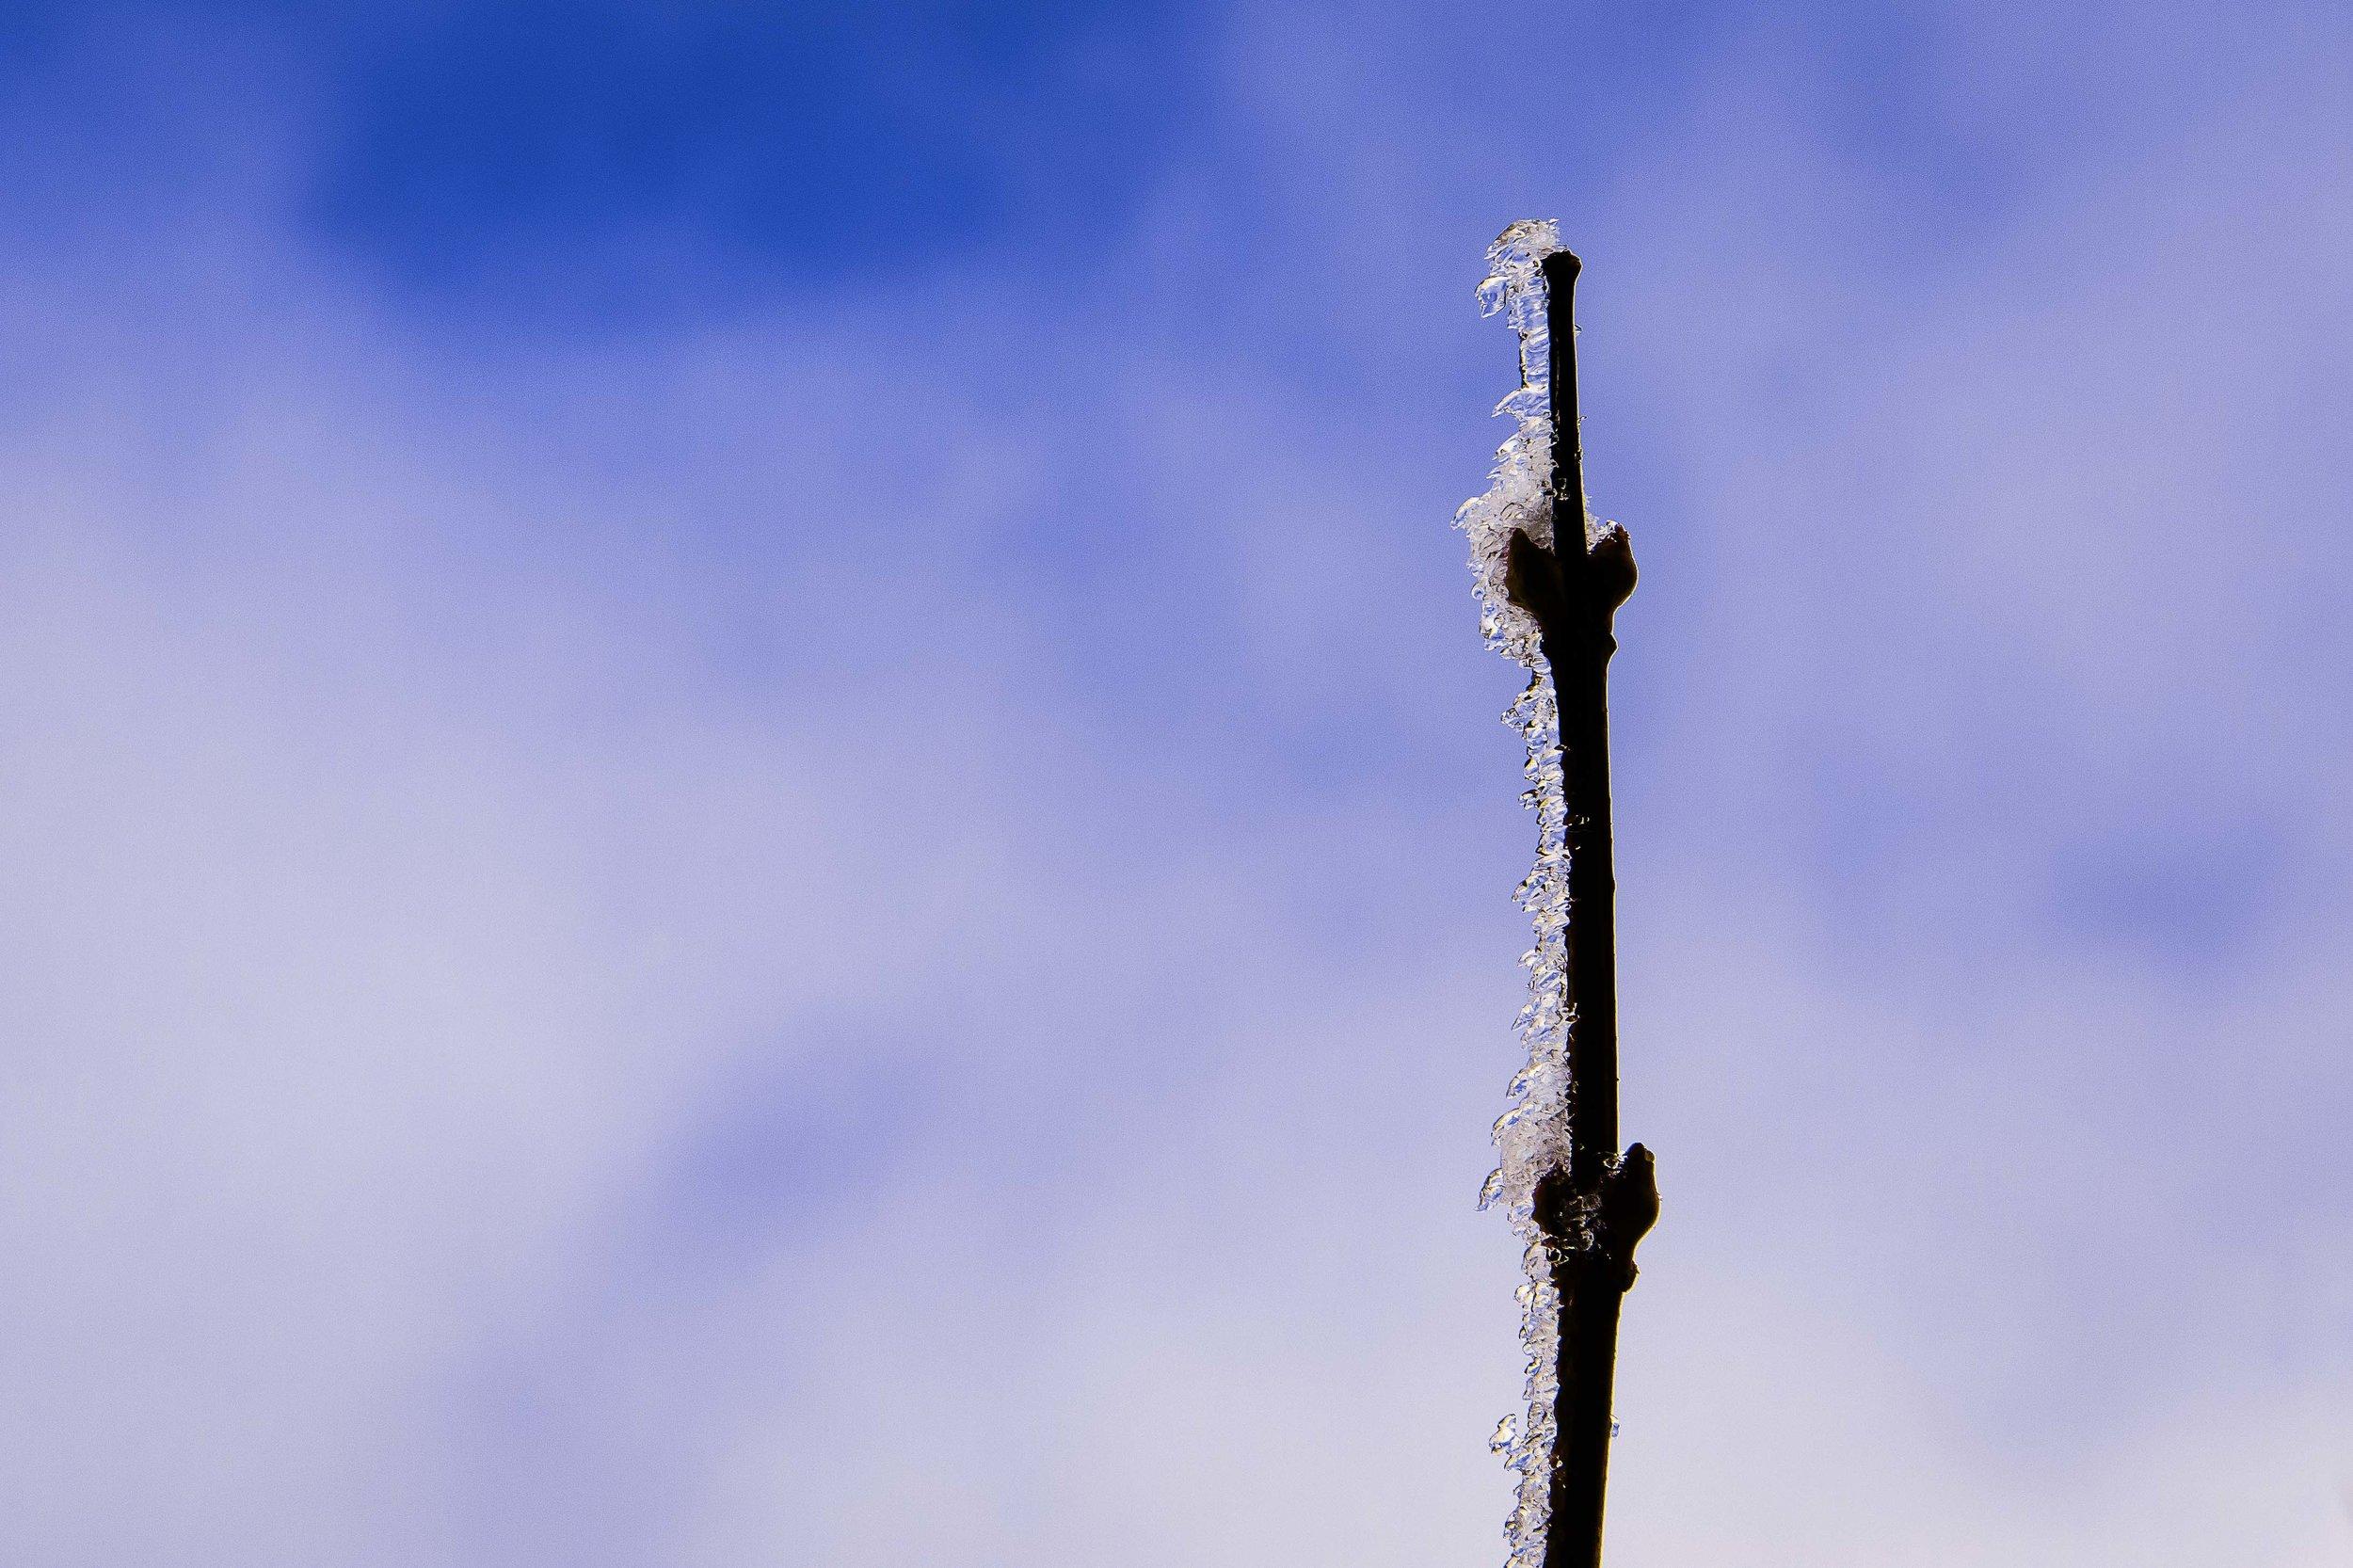 viewfinder-sneeuwlandschap-fotograferen-minimalisme-fotografie